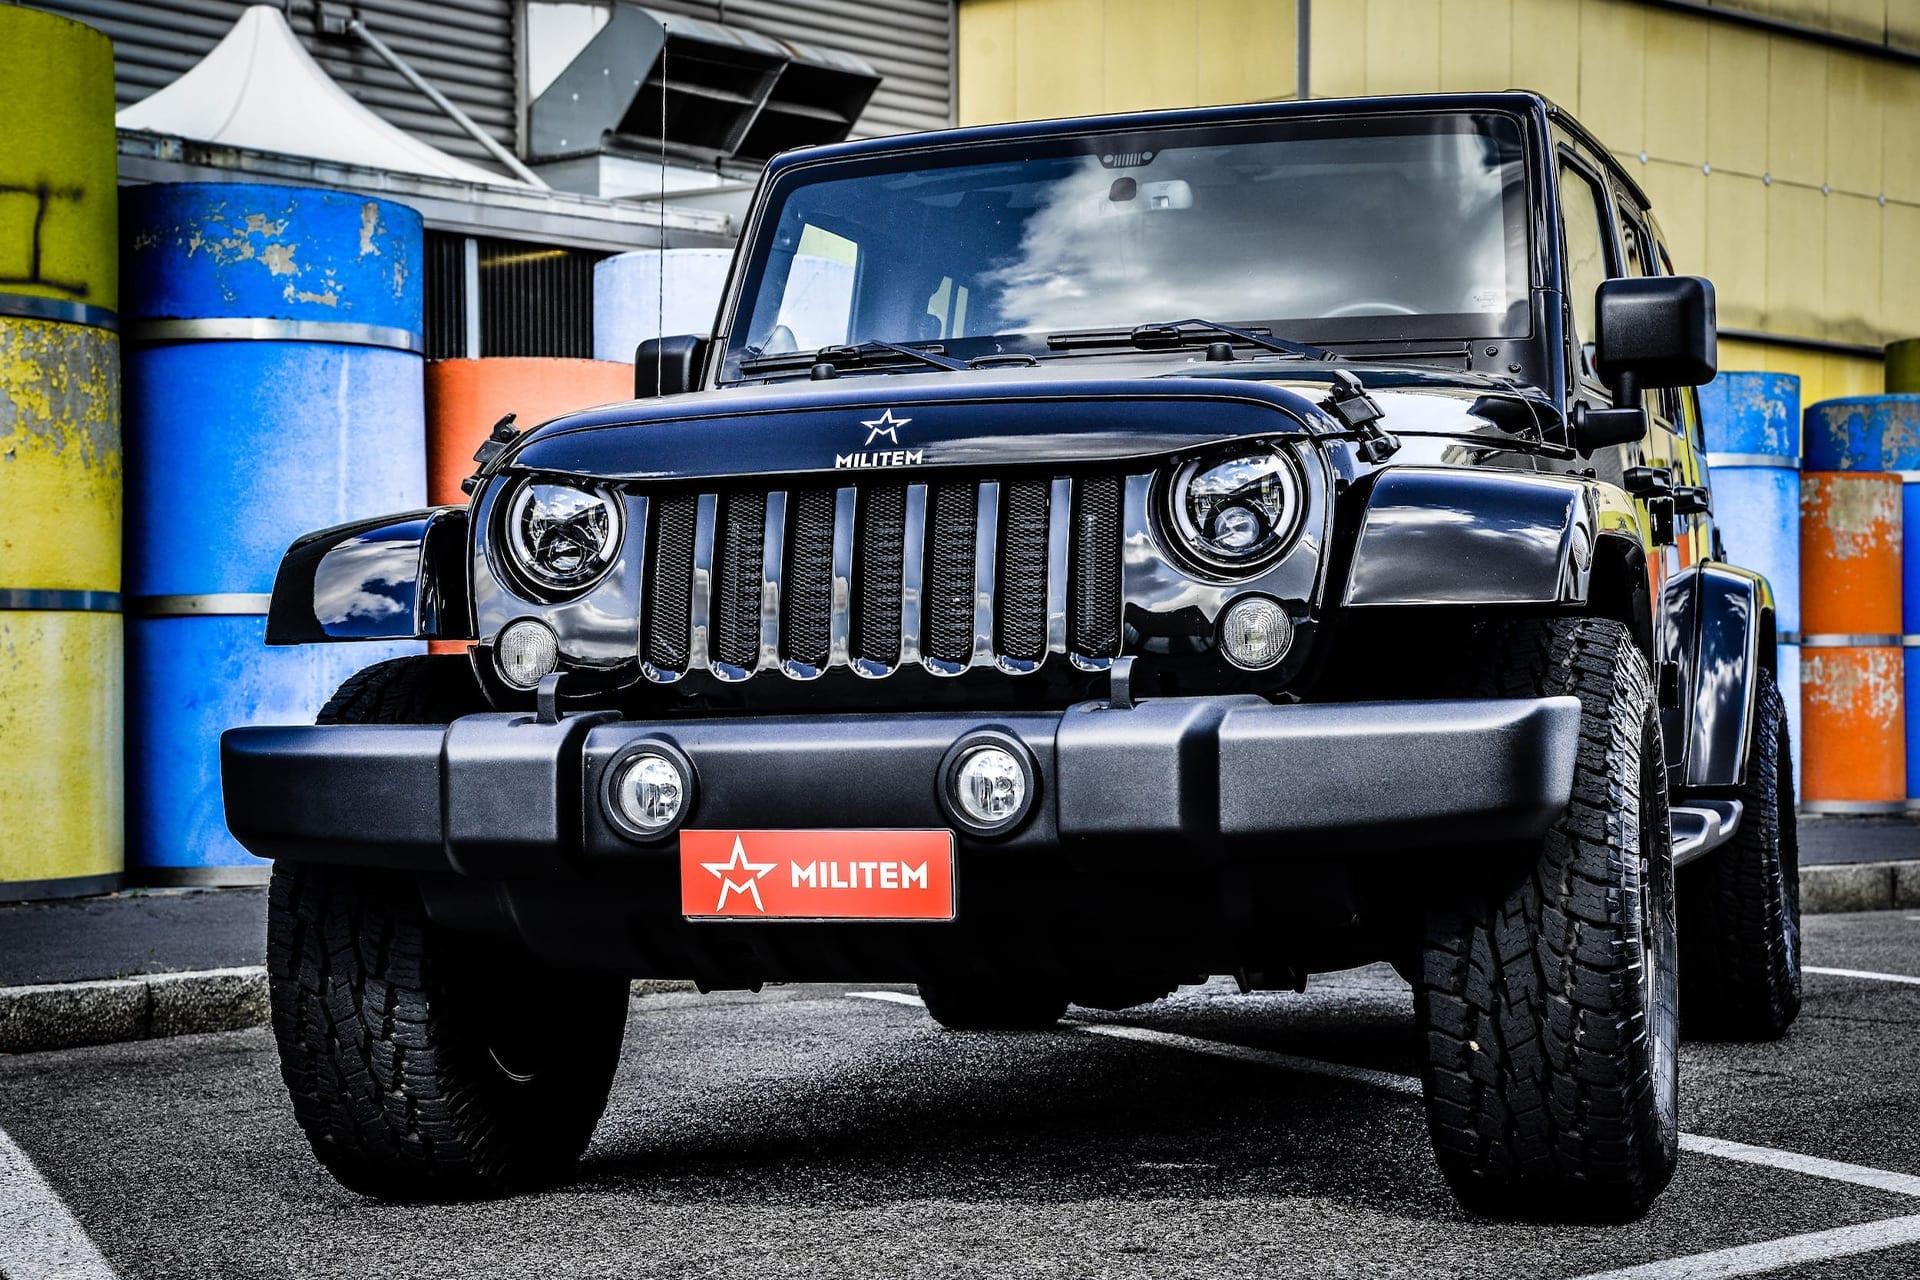 american jeep 4x4 militem